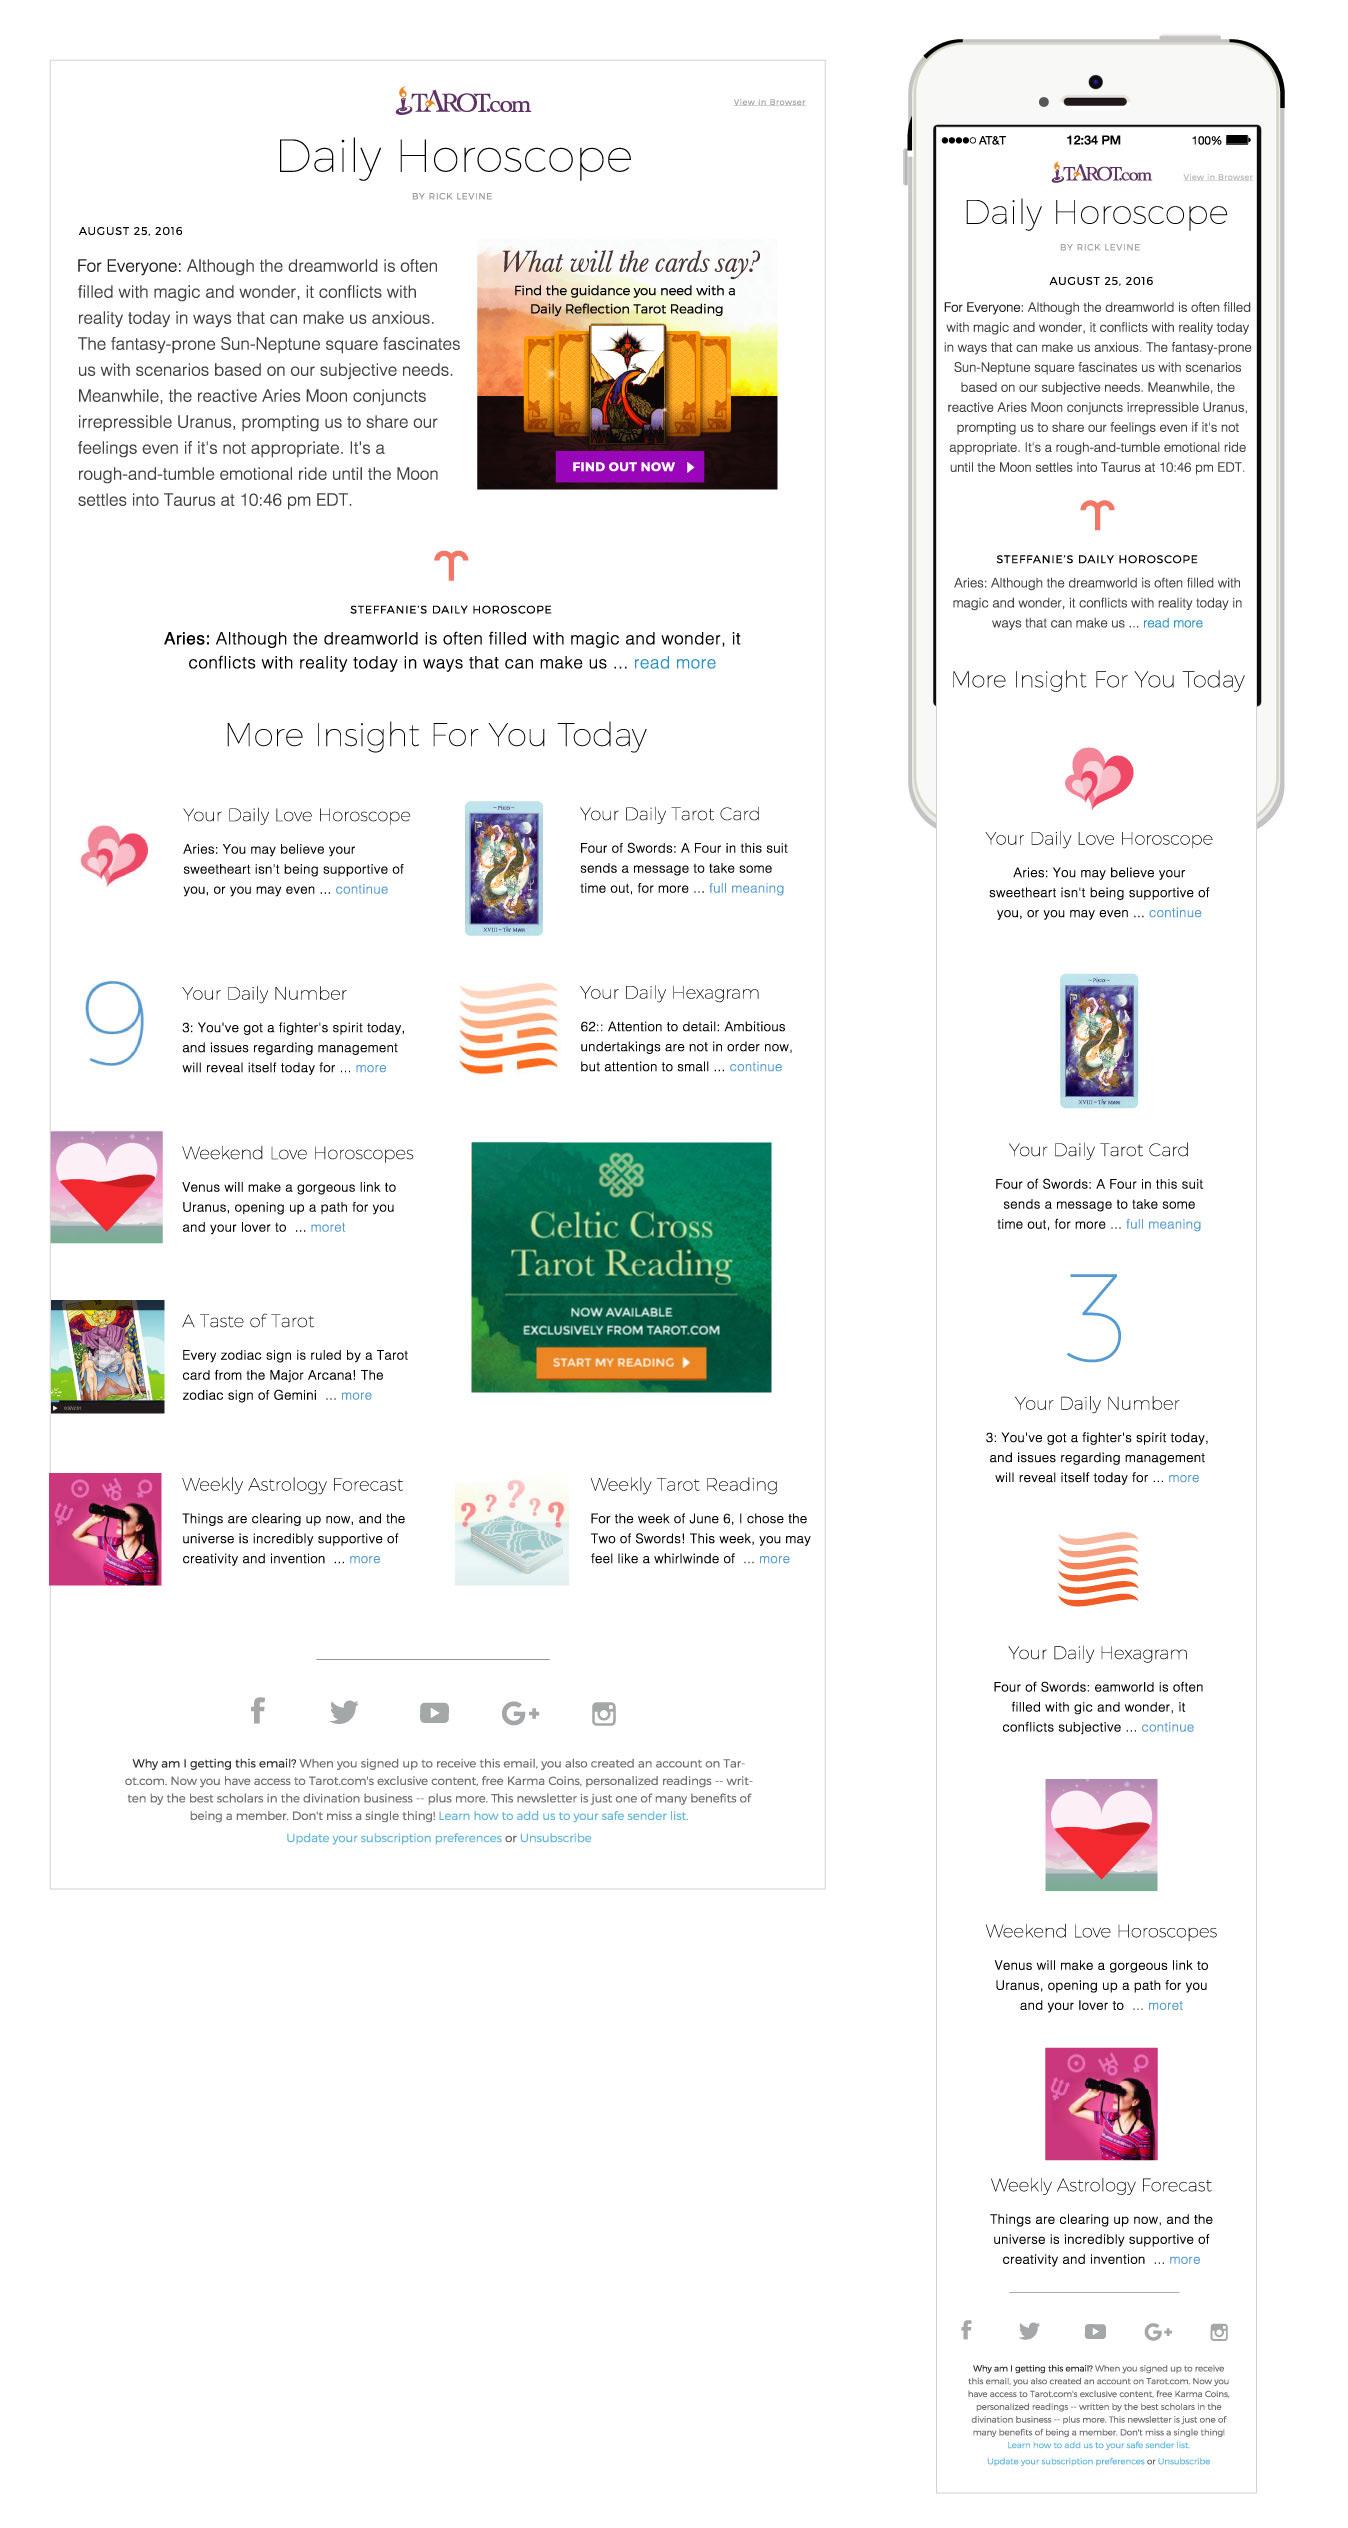 daily horoscope email